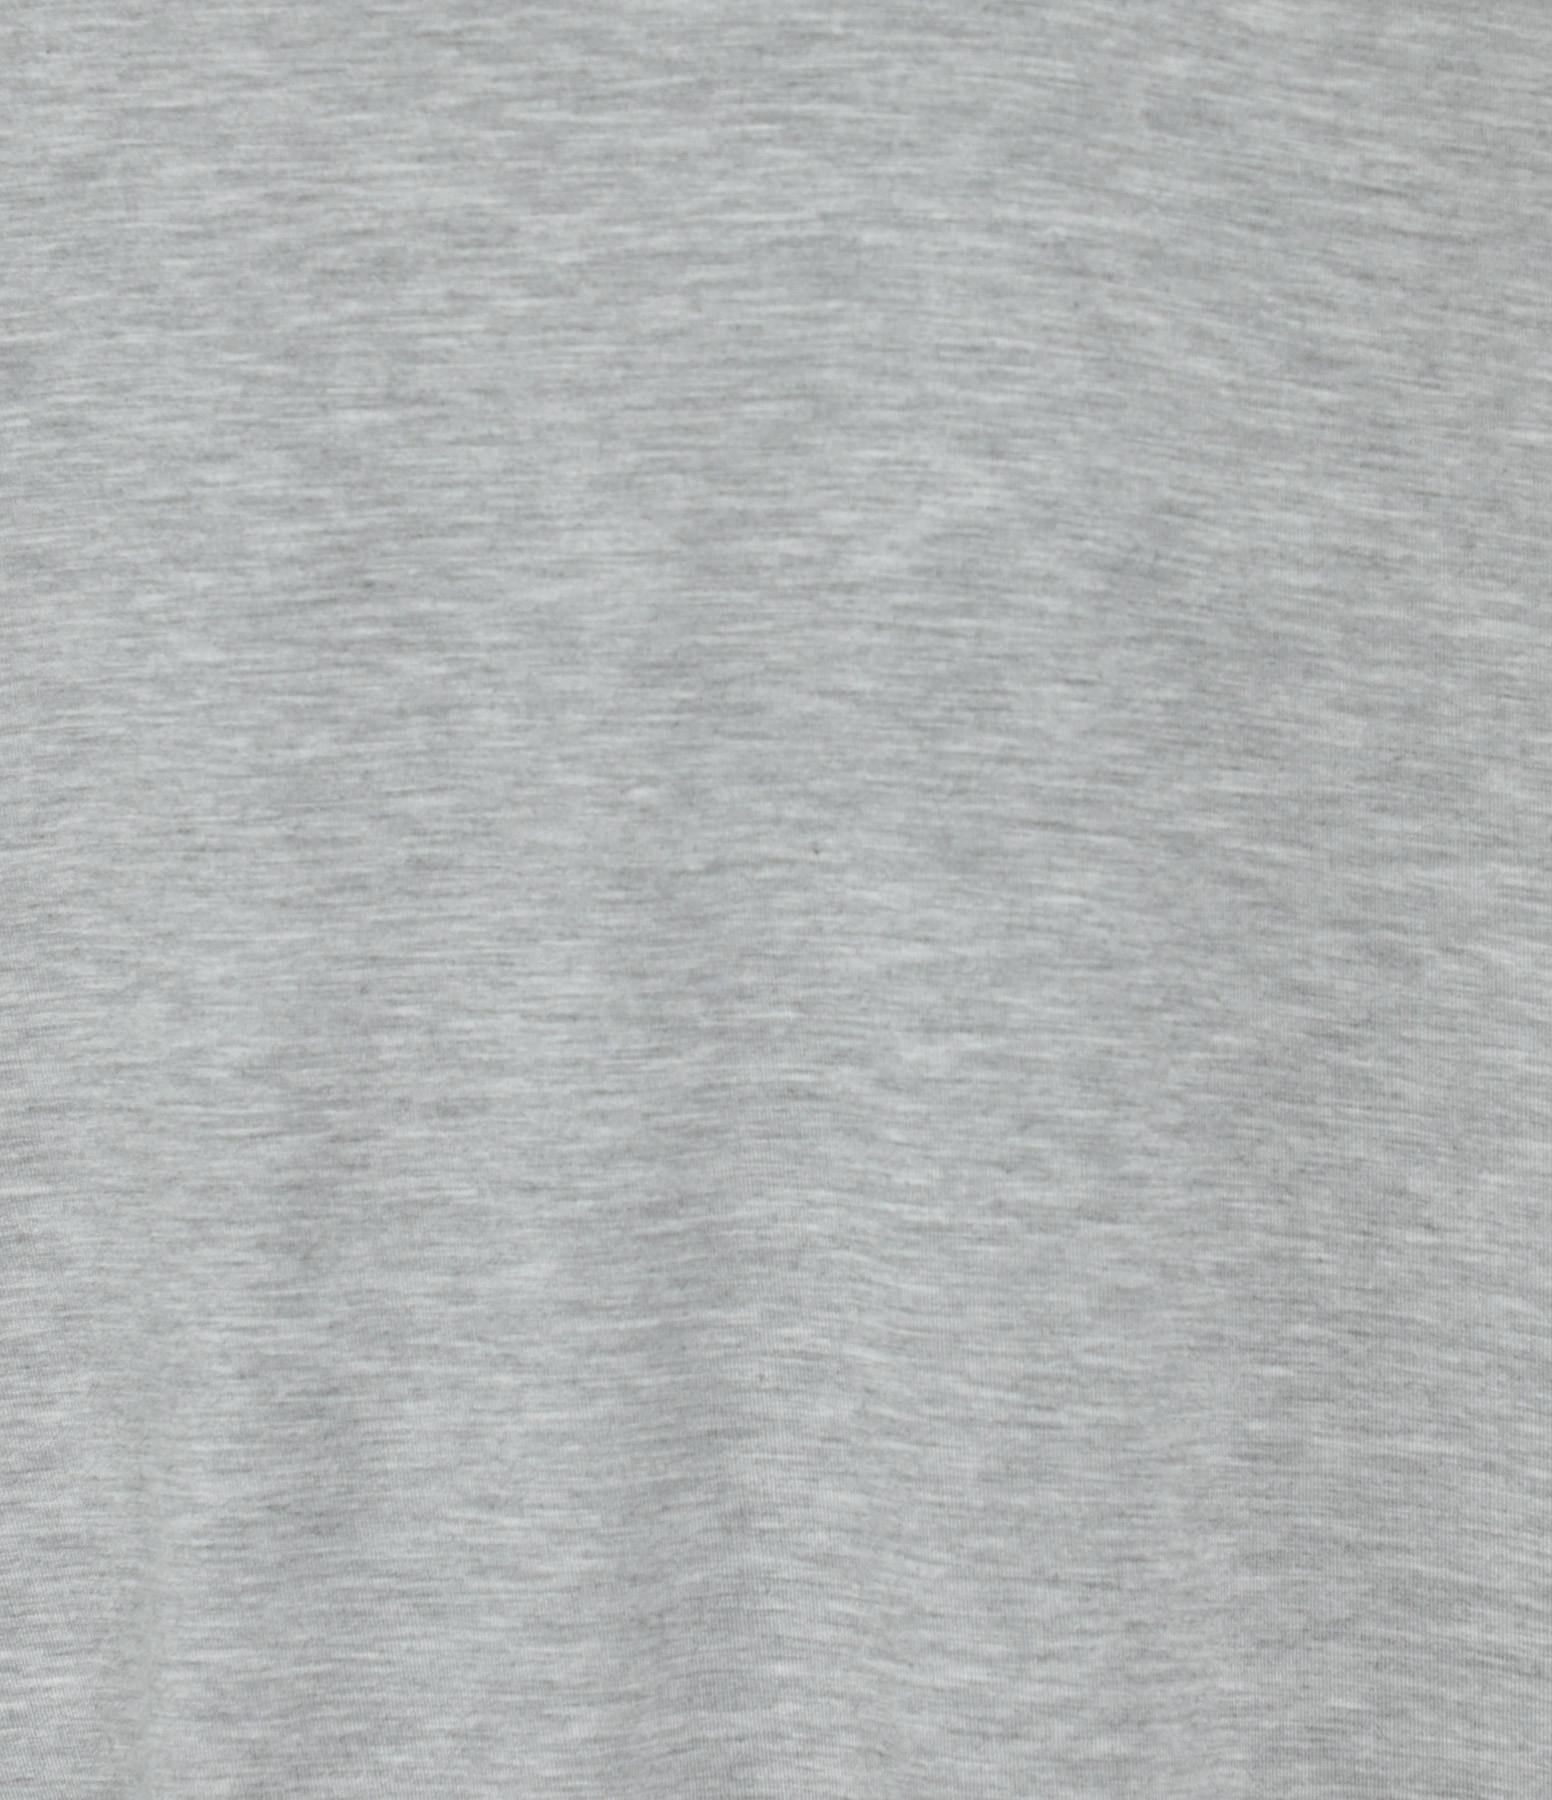 MAJESTIC FILATURES - Tee-shirt Col V Gris Chiné Clair